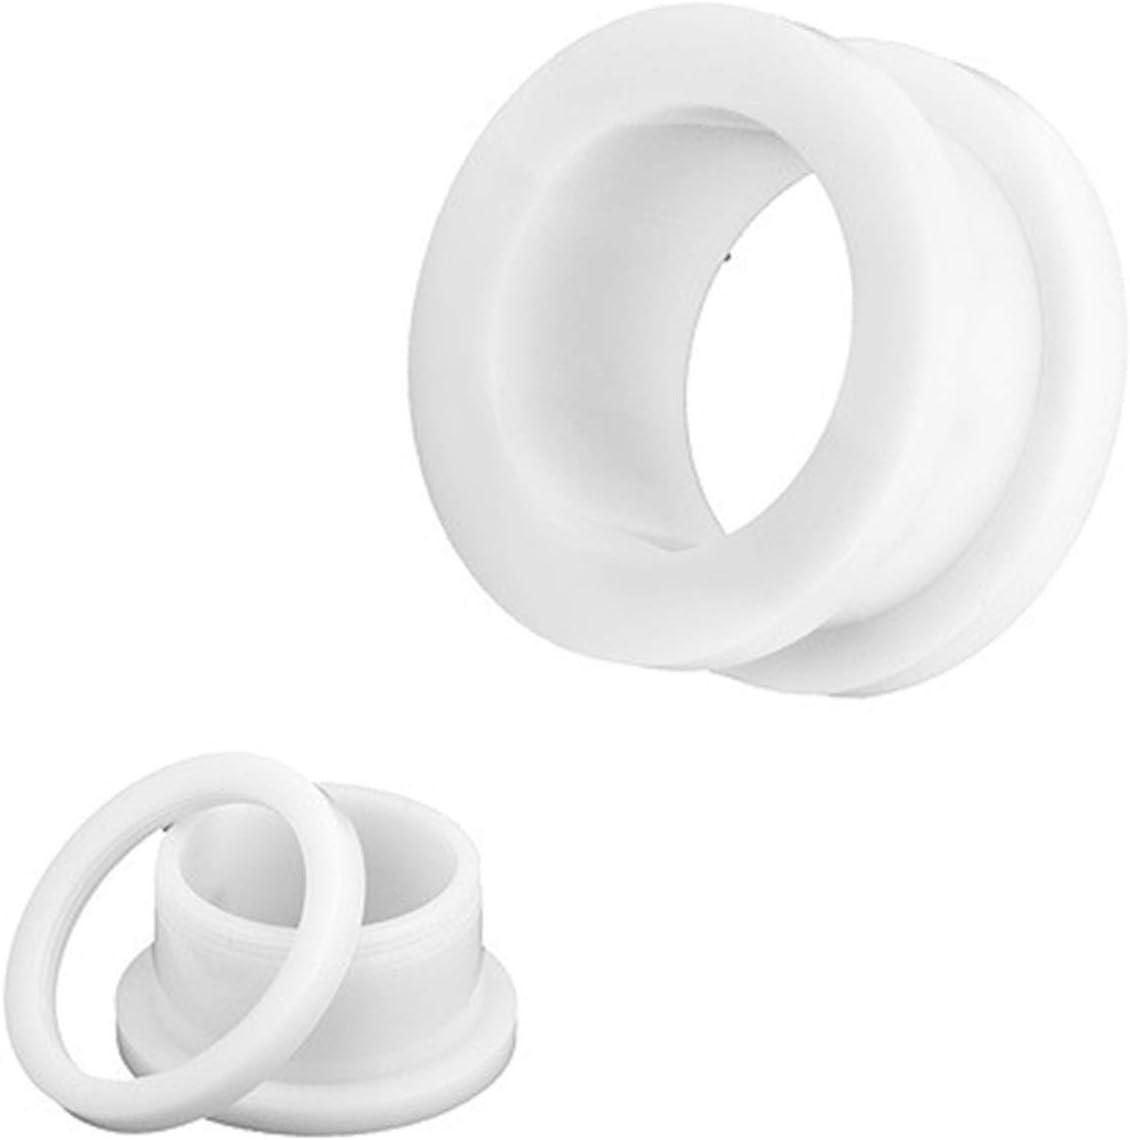 HBJSDGV Ear Expander 10Pcs lot Sale SALE% OFF Fake an Cheater Inexpensive Plugs Acrylic